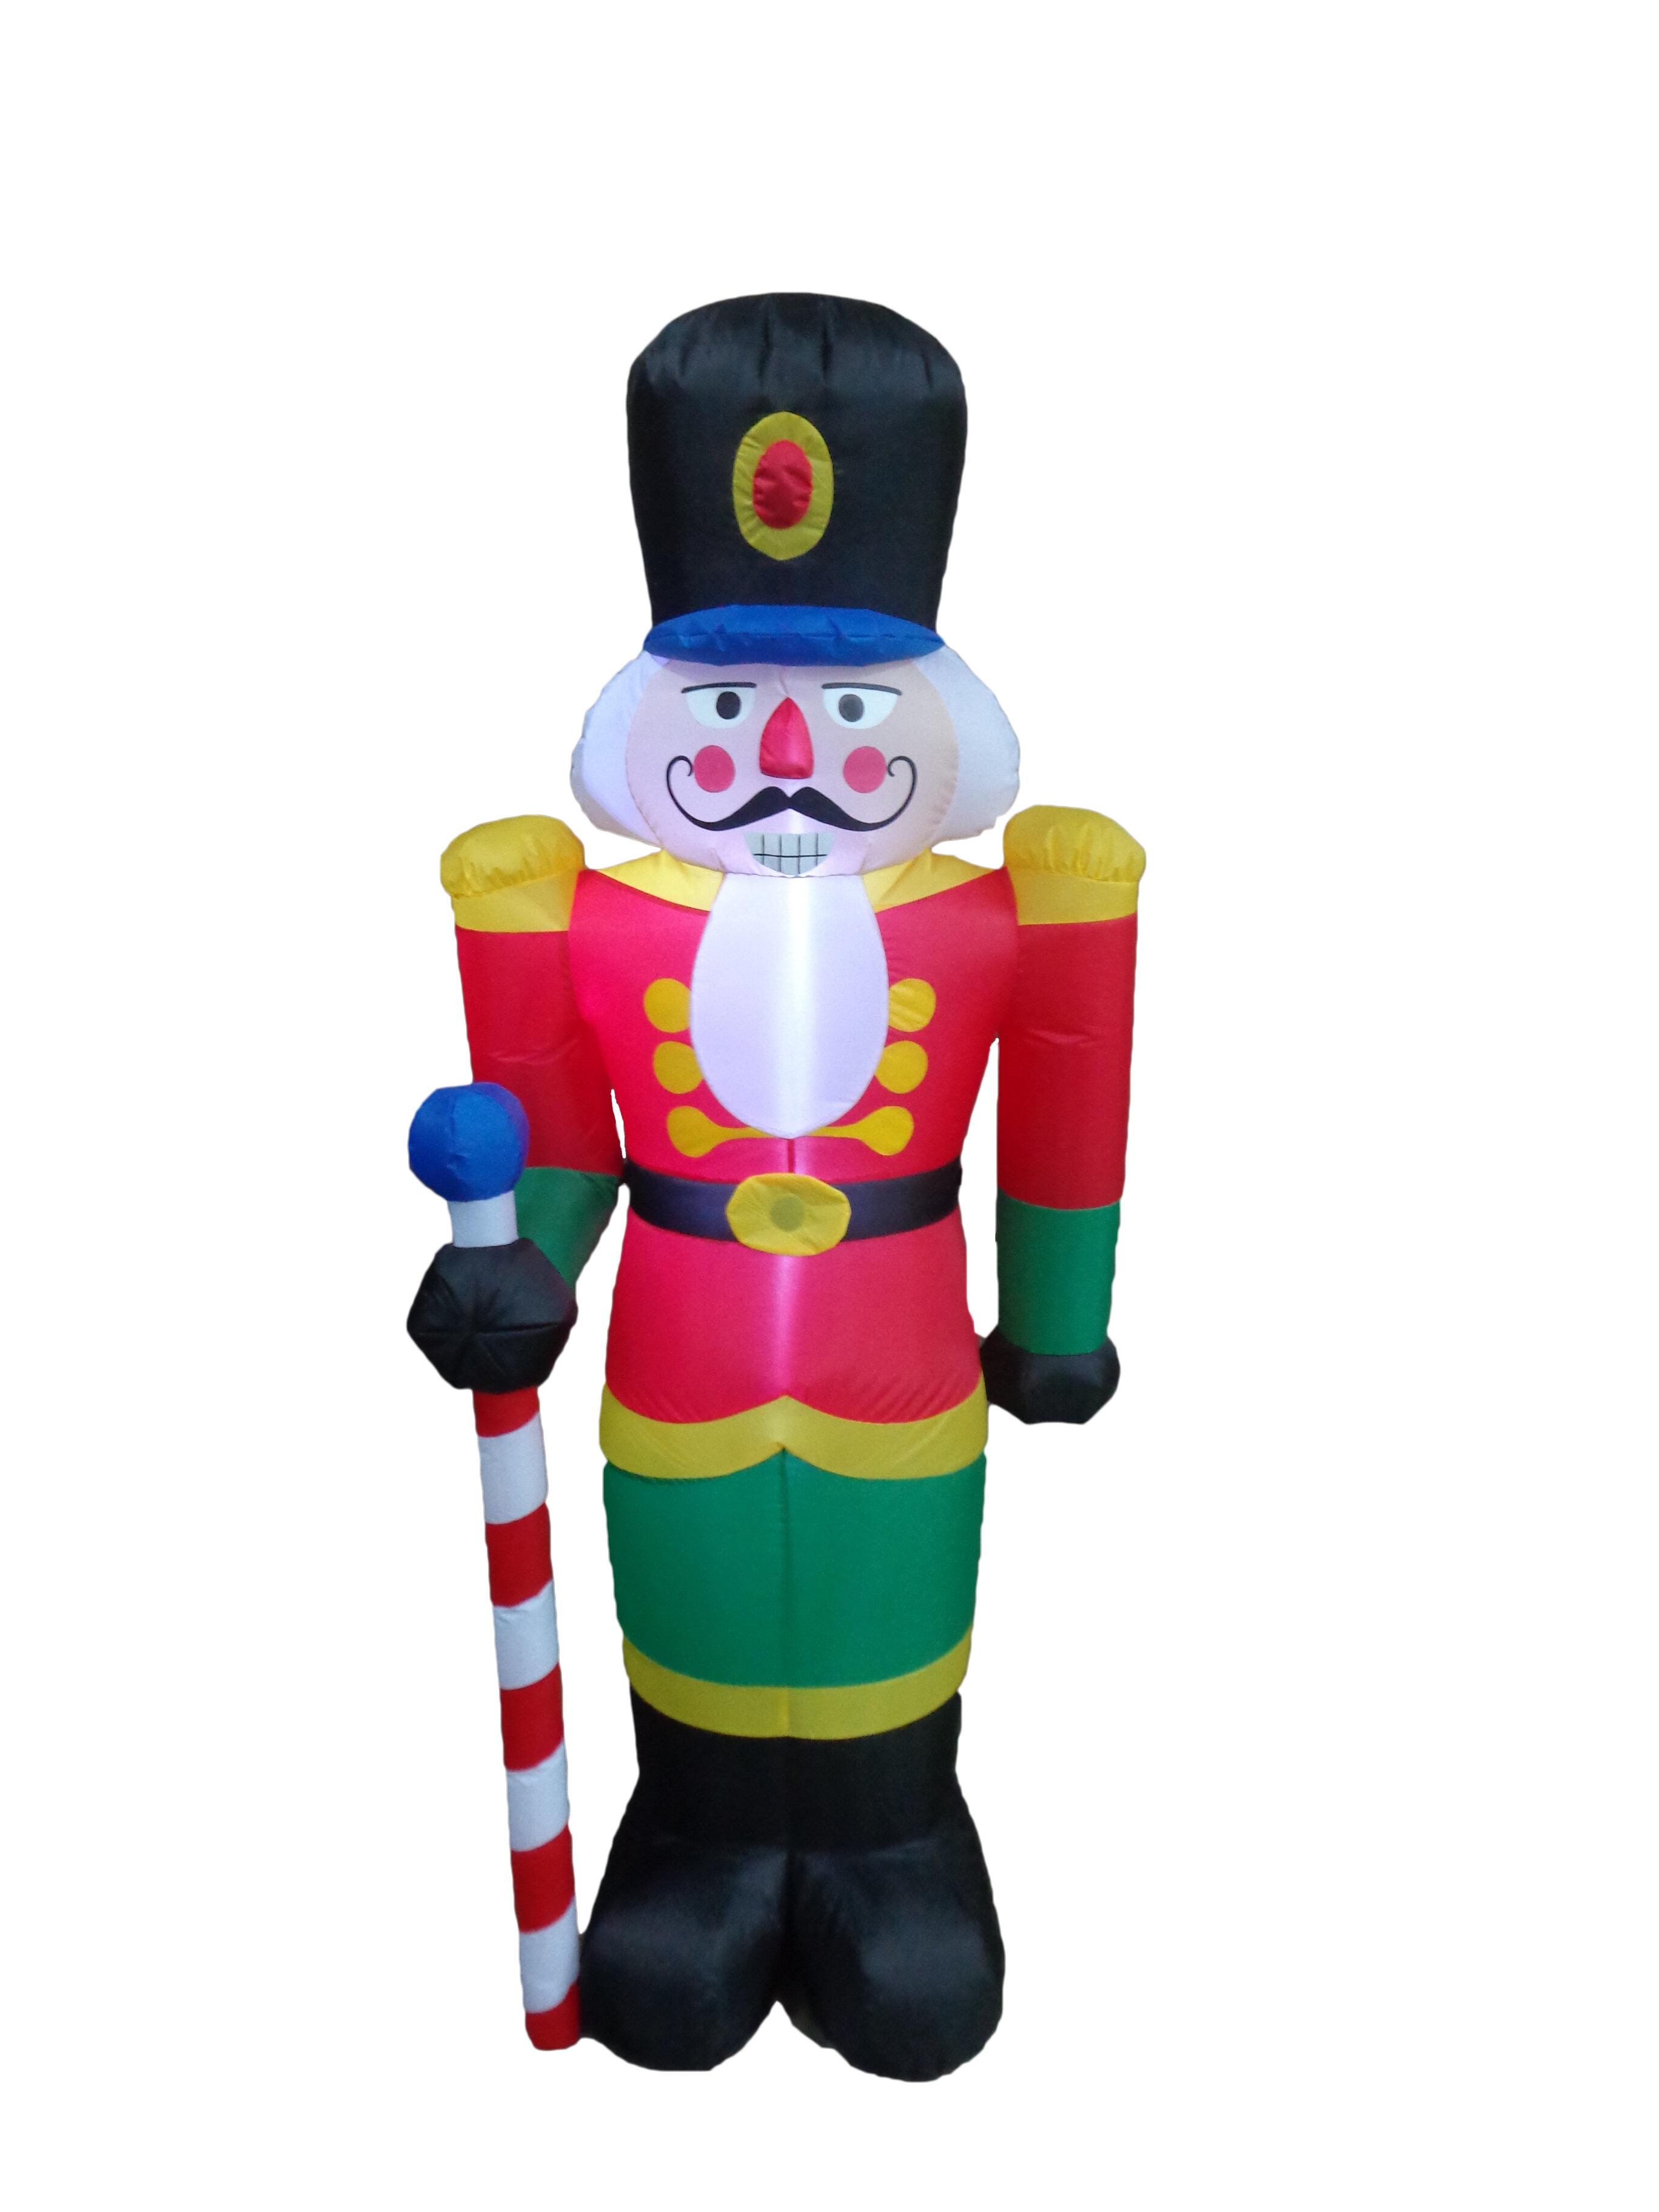 The Holiday Aisle Nutcracker Christmas Inflatable & Reviews | Wayfair